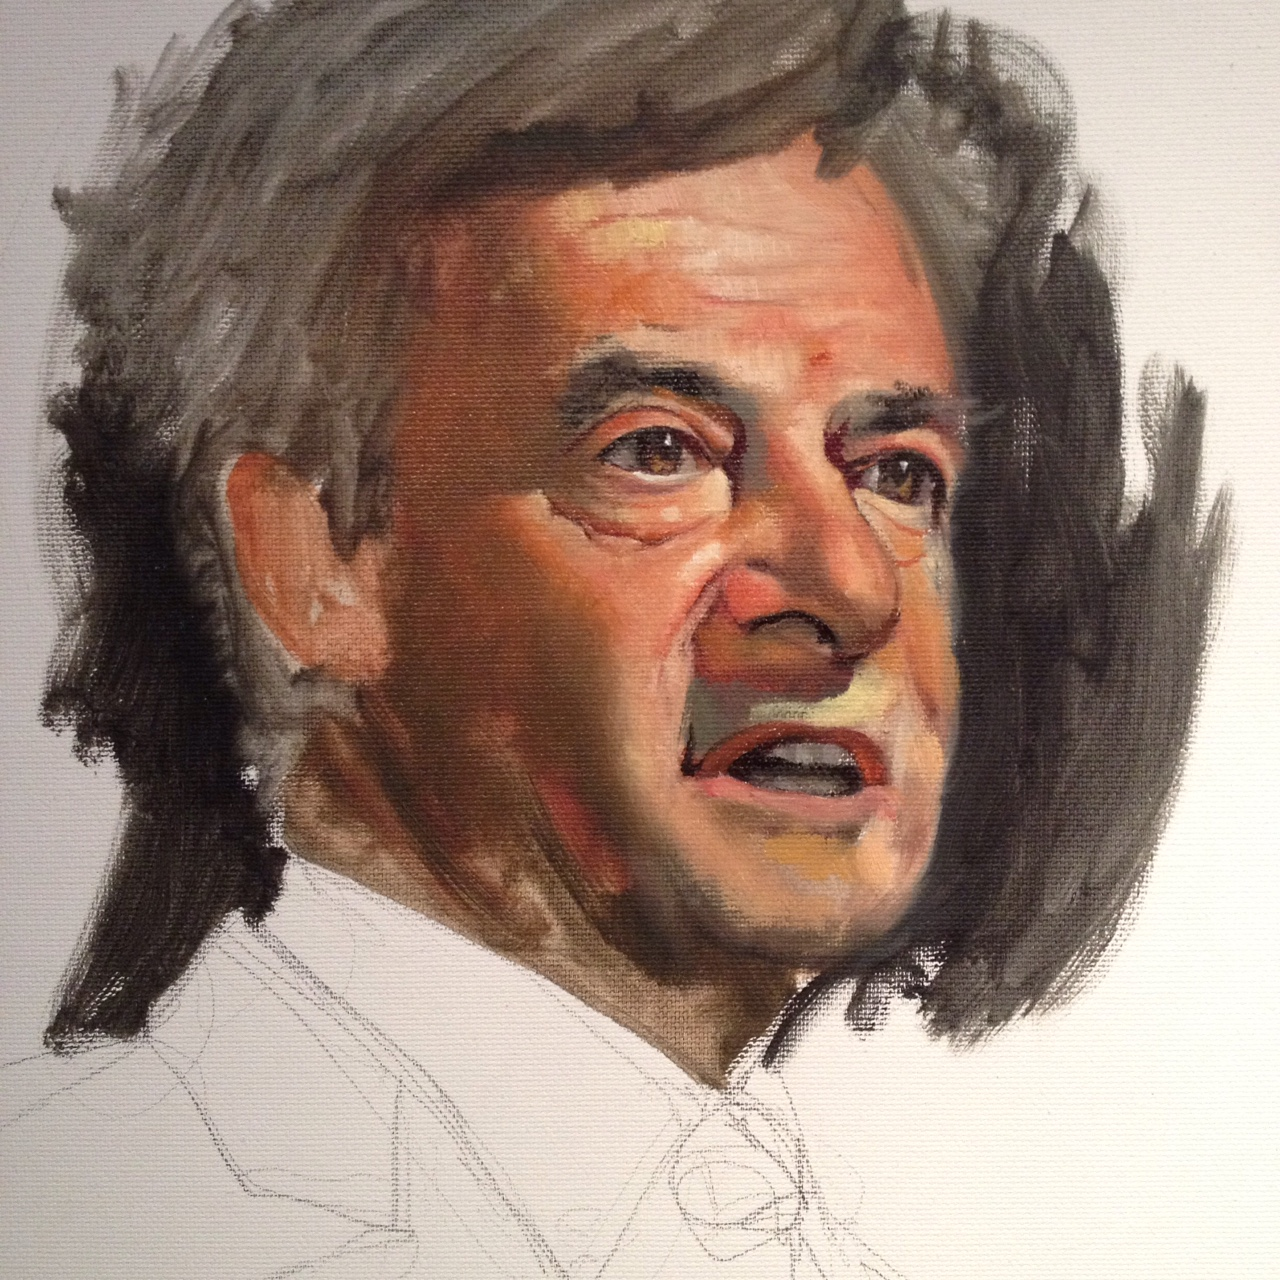 Portraits politiques